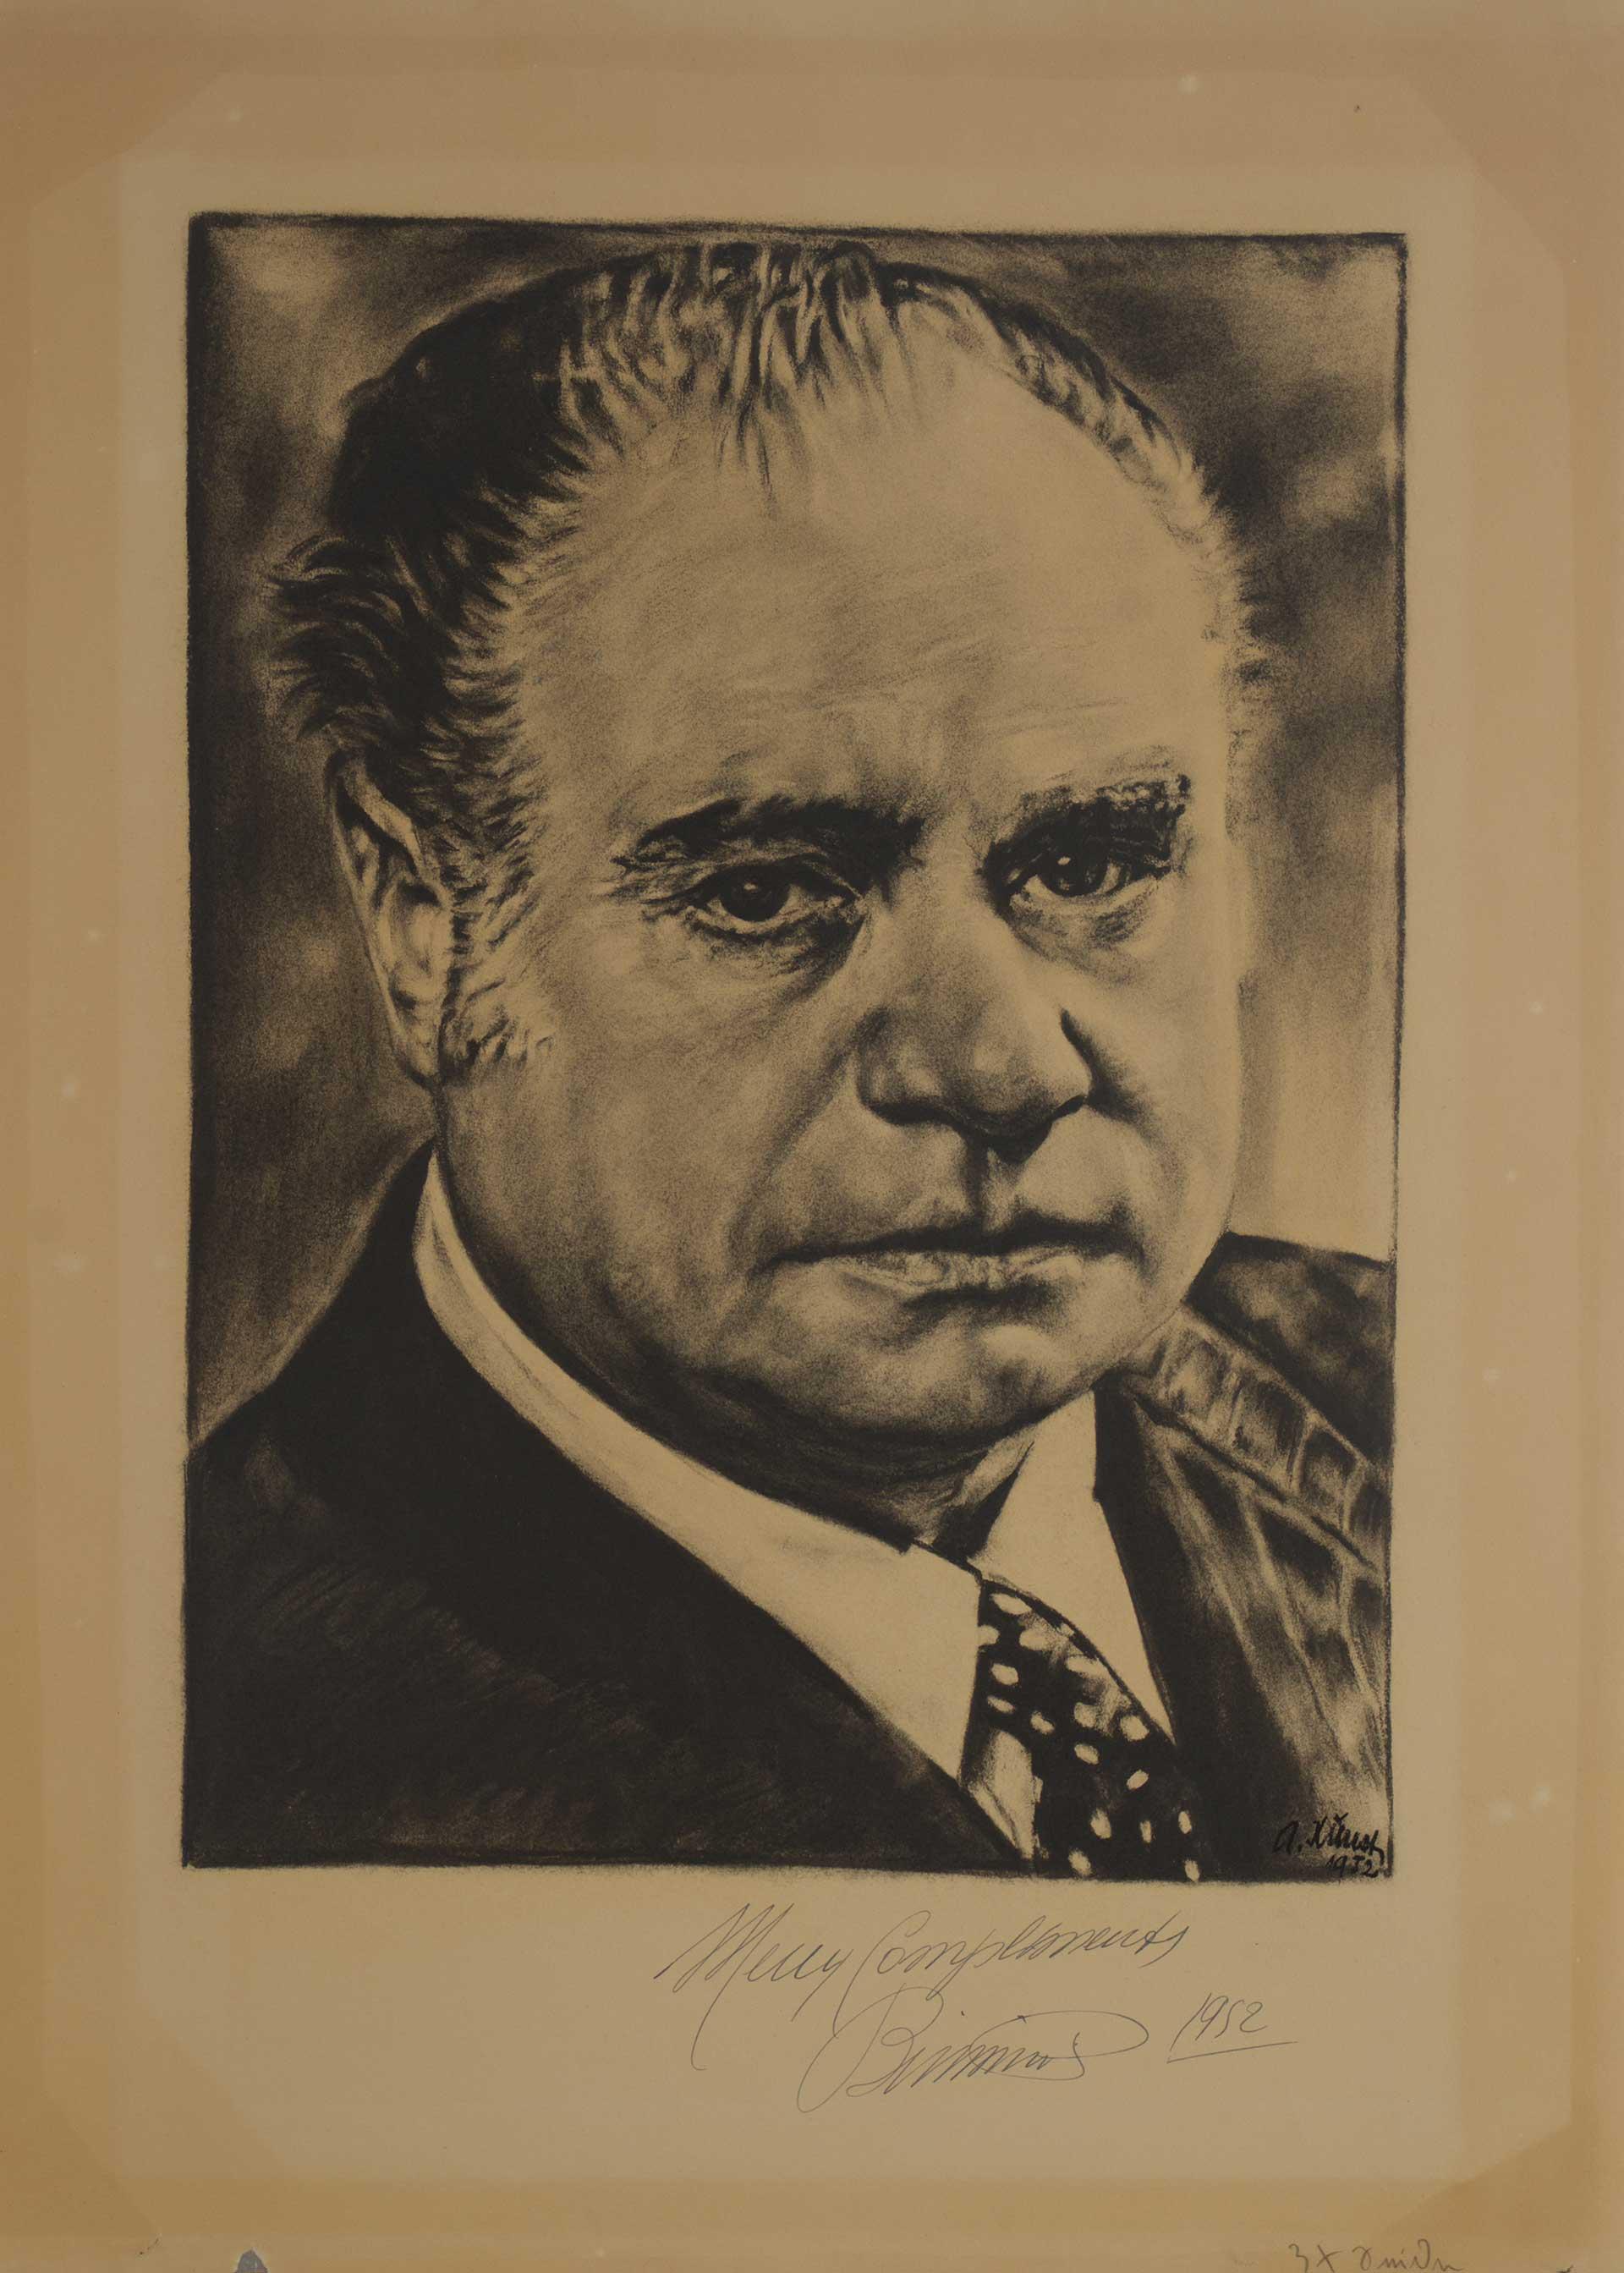 Filmstar und Opernsänger Beniamino Gigli